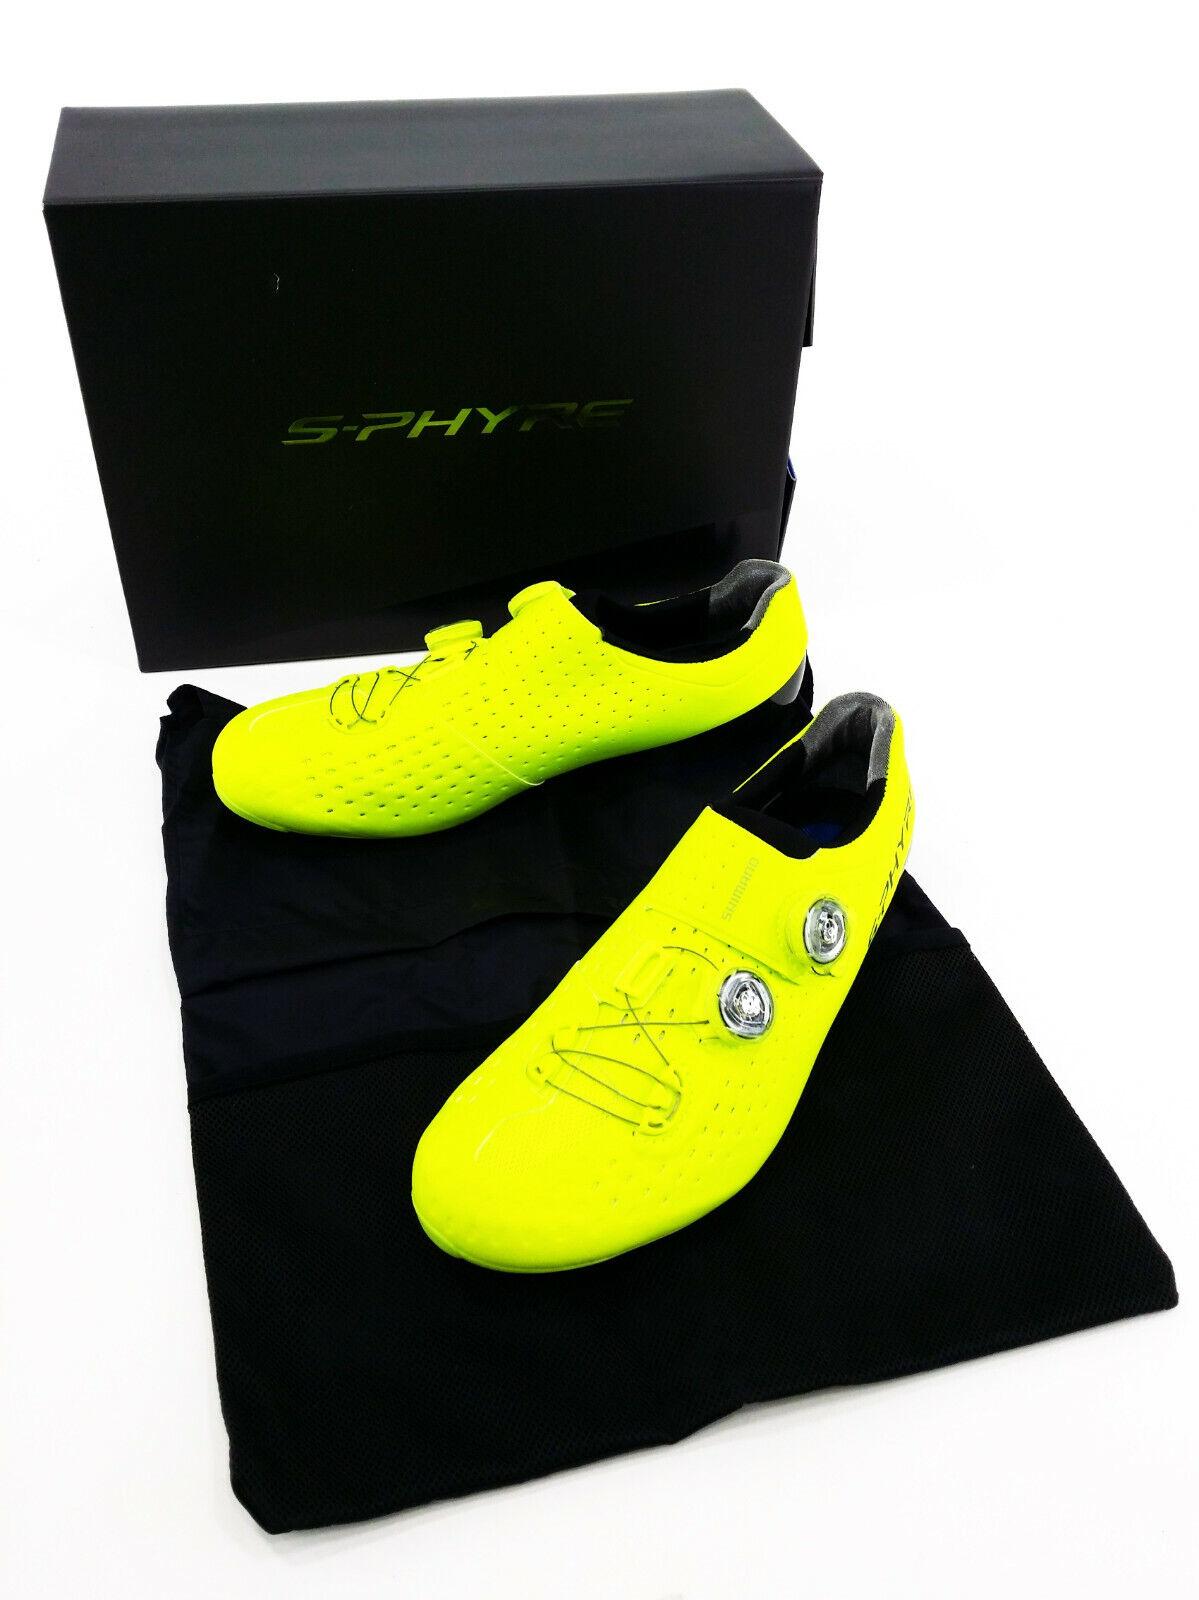 Shimano RC9Y S-Phyre Road Bike Shoes, Yellow, US 8.9 / EU 43